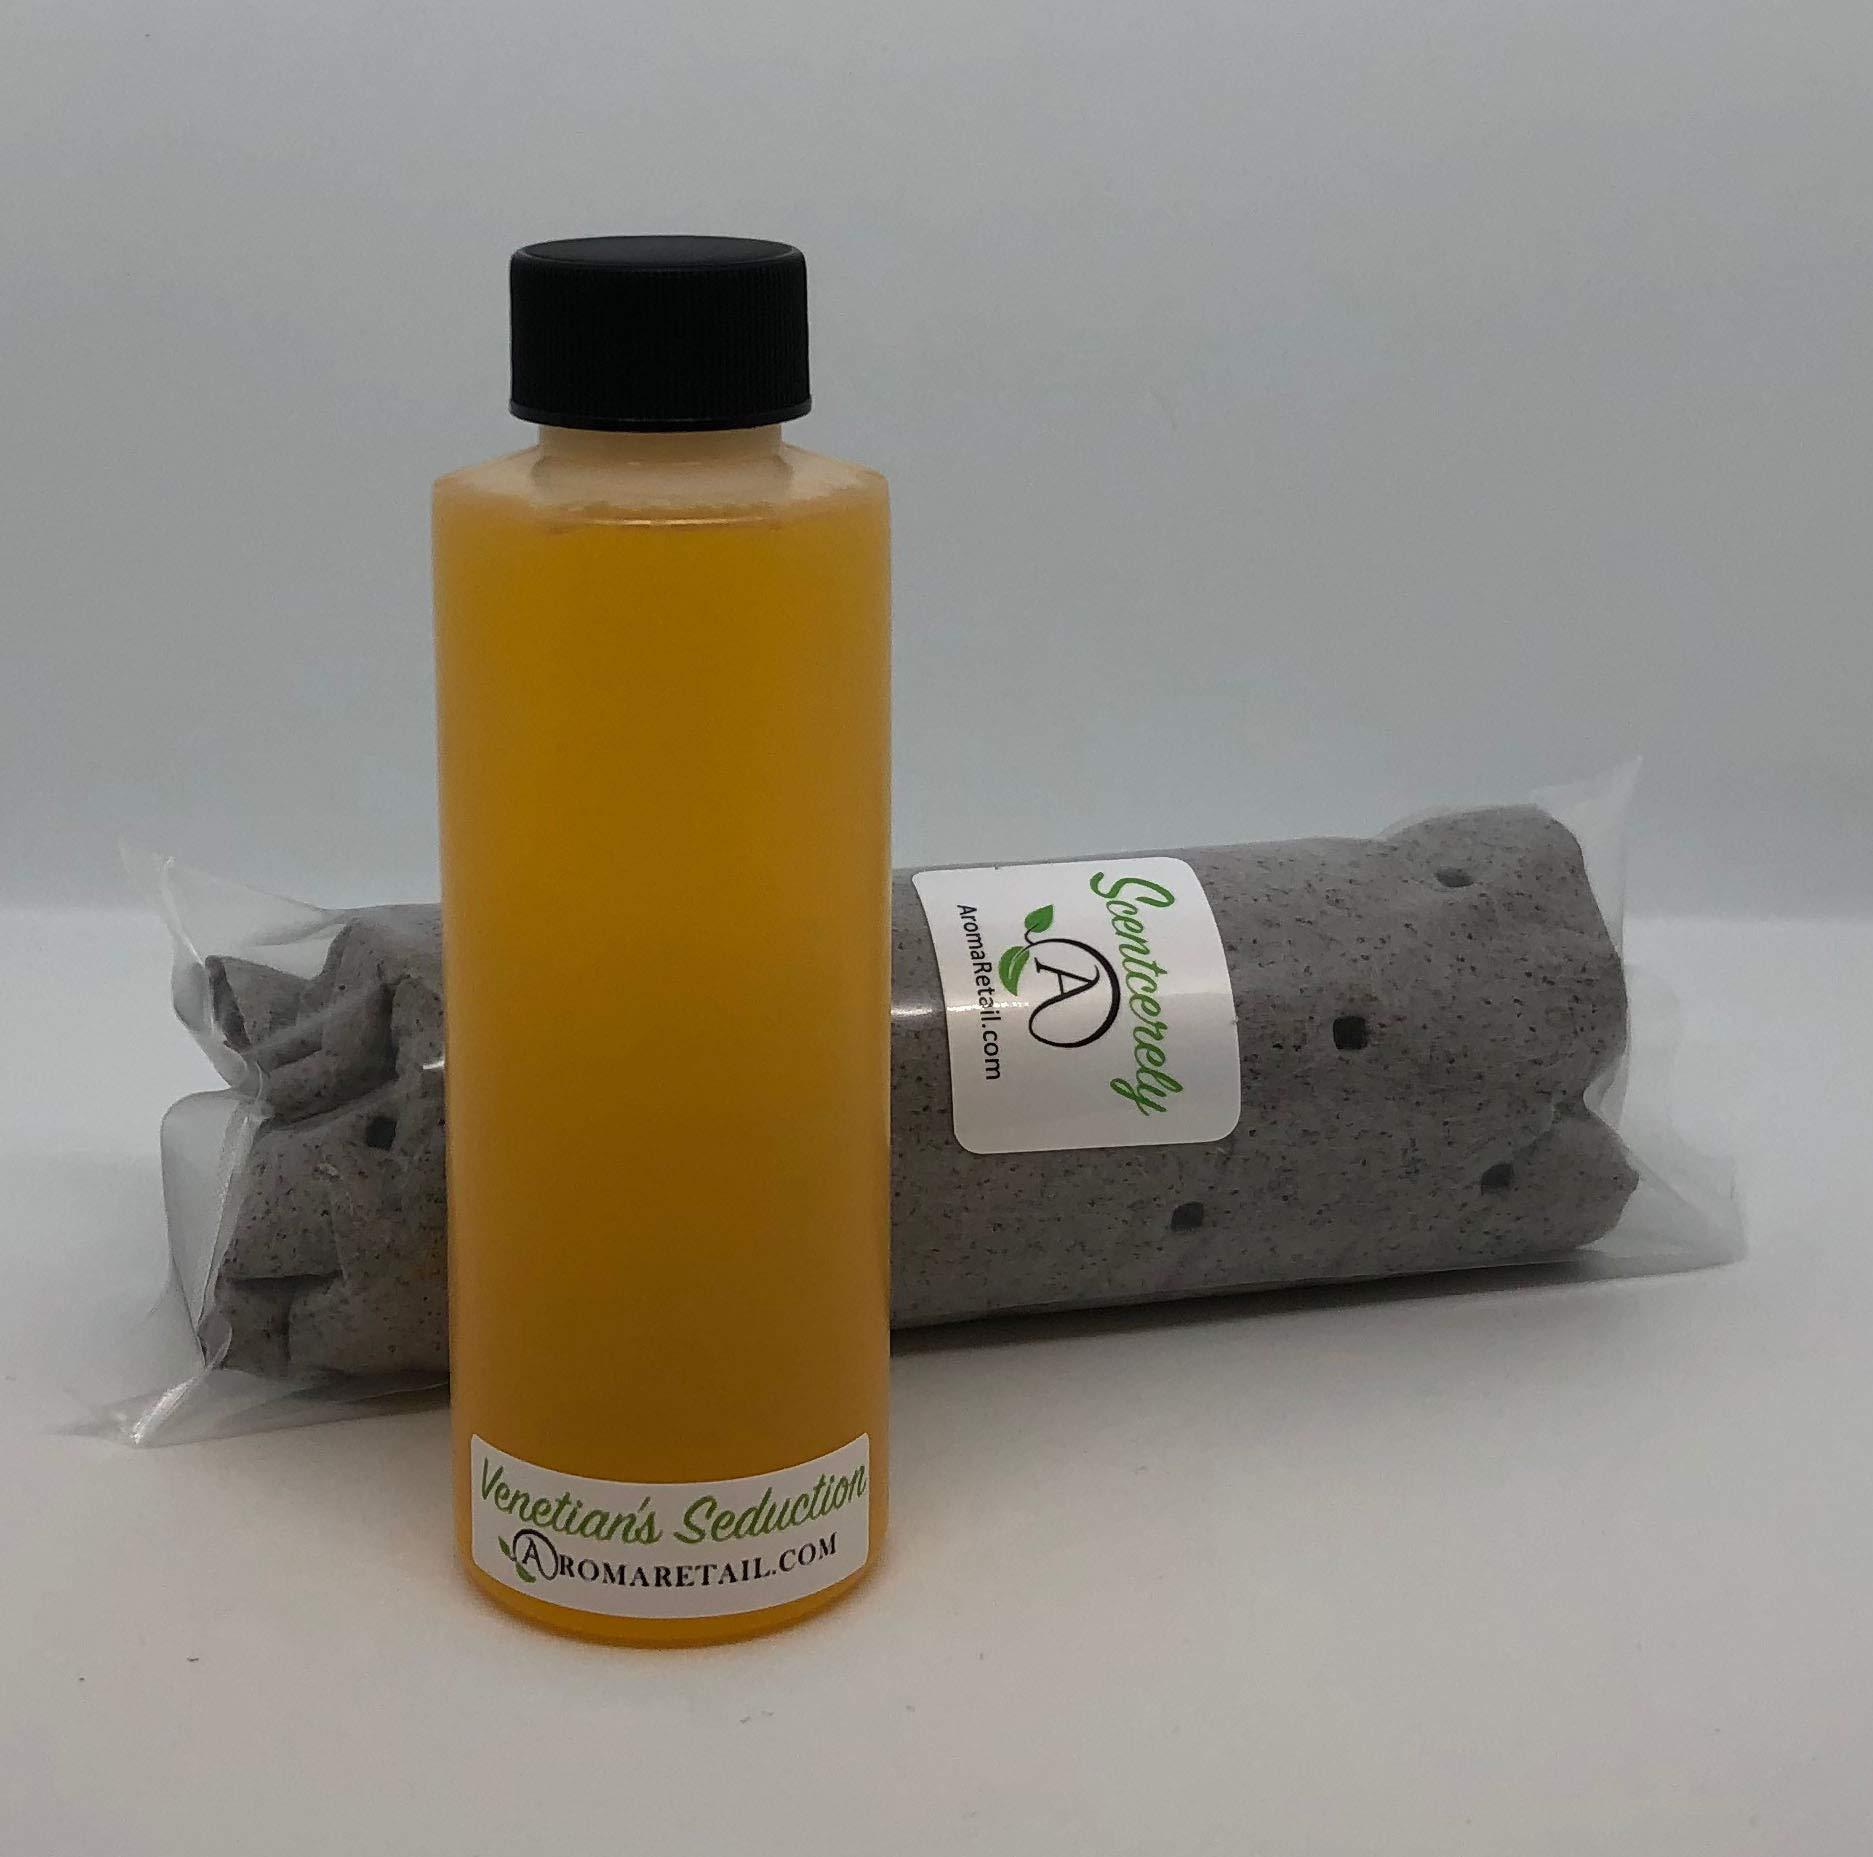 Aroma Retail 4 oz Fragrance Oil Refill - Seduction, Experienced at The Venetian Hotel Las Vegas Before 2015